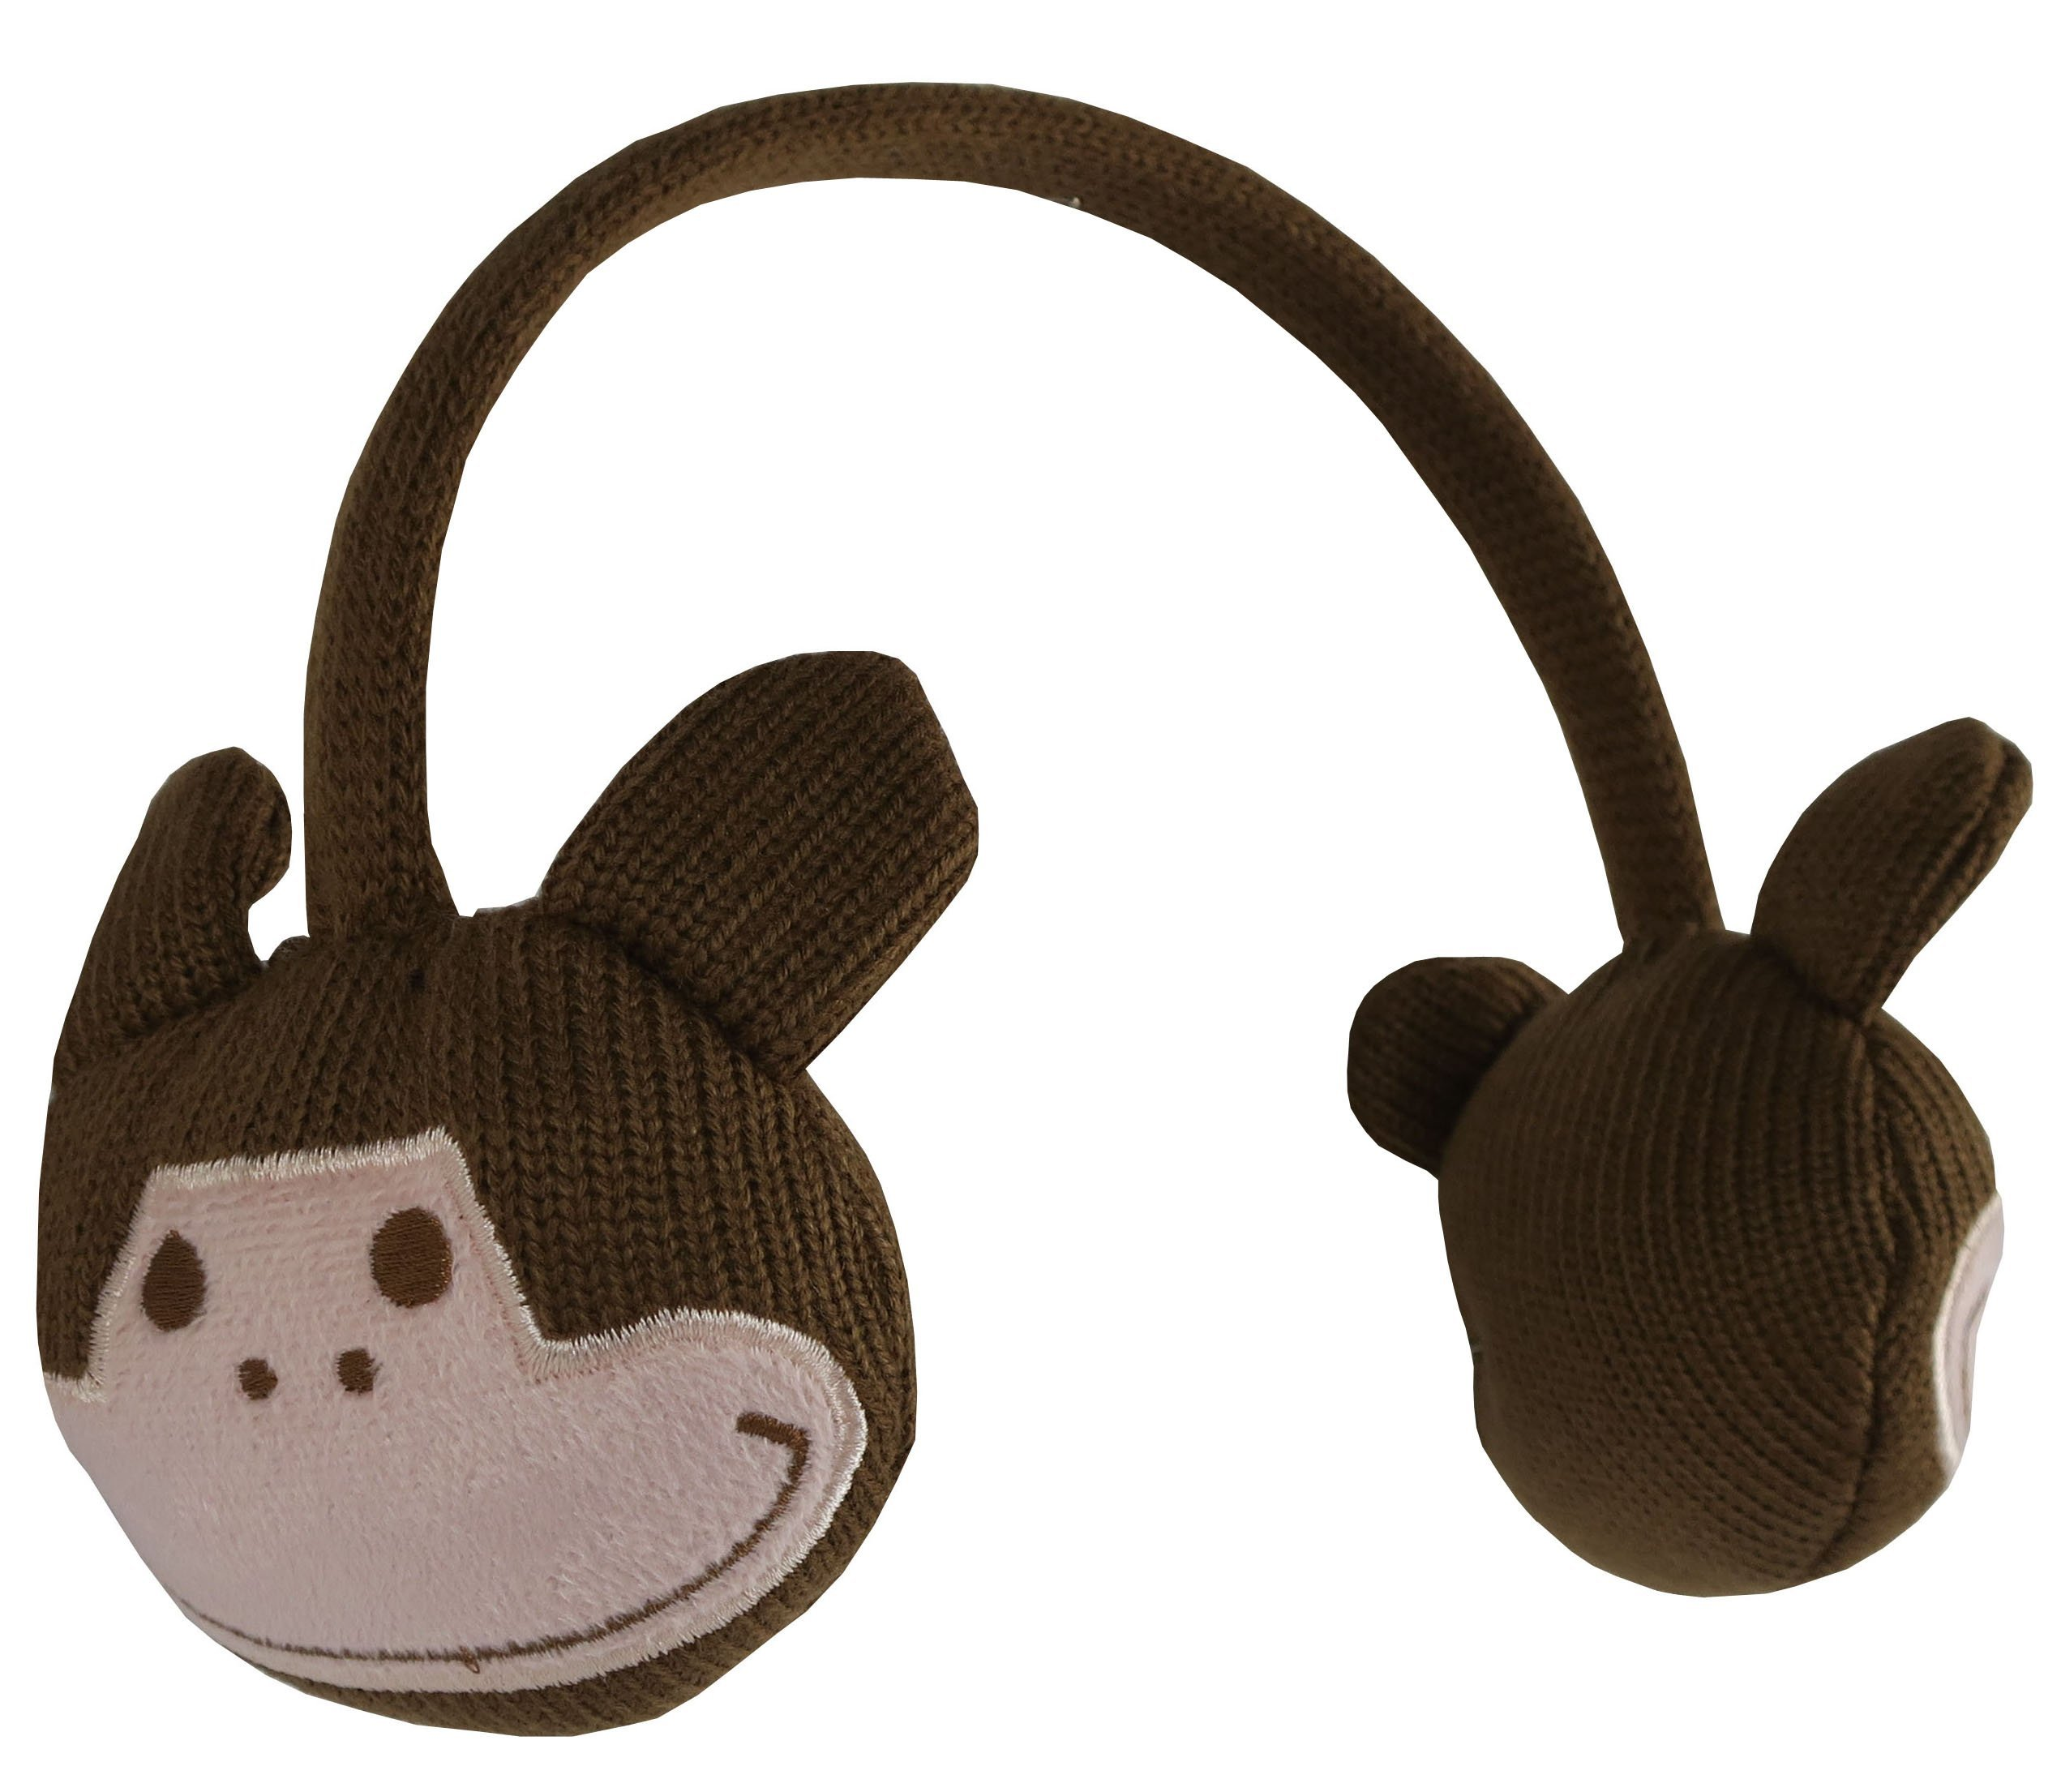 RUYA Unisex Winter Warm Earmuffs Thicken Faux Fur Thermal Ear Warmer Ear muff